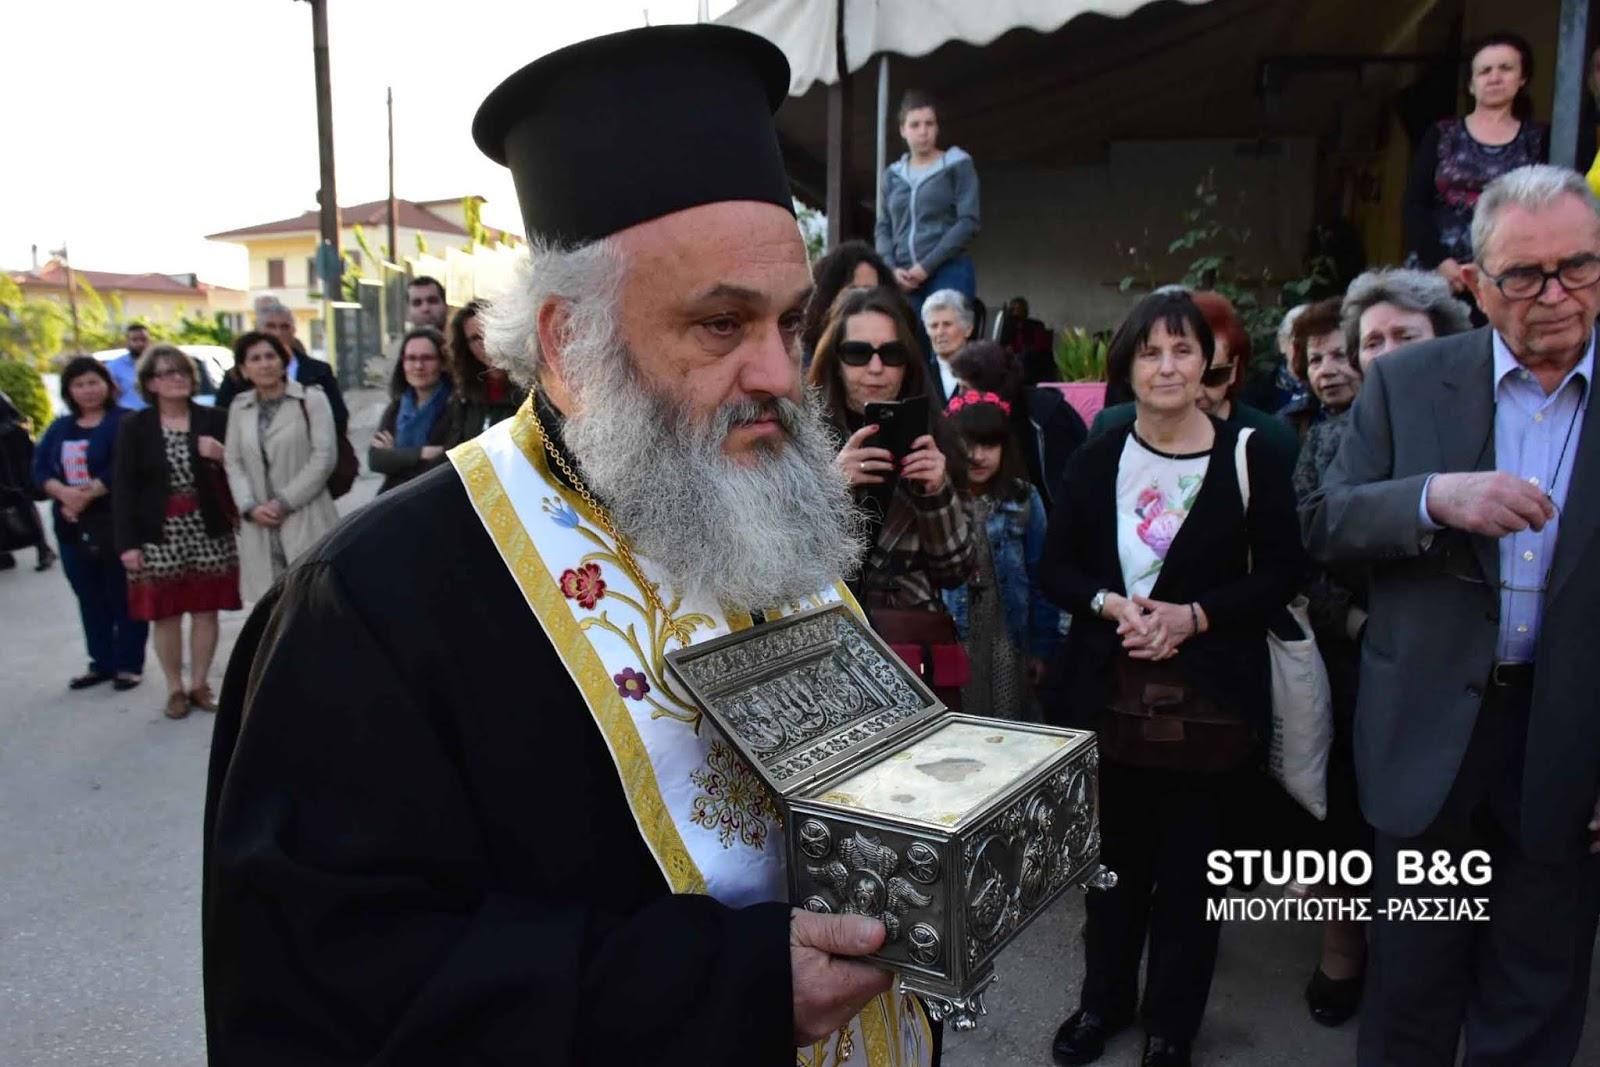 Tα ιερά λείψανα των Αγίων Ραφαήλ, Νικολάου και Ειρήνης στην Αγία Αικατερίνη Άργους